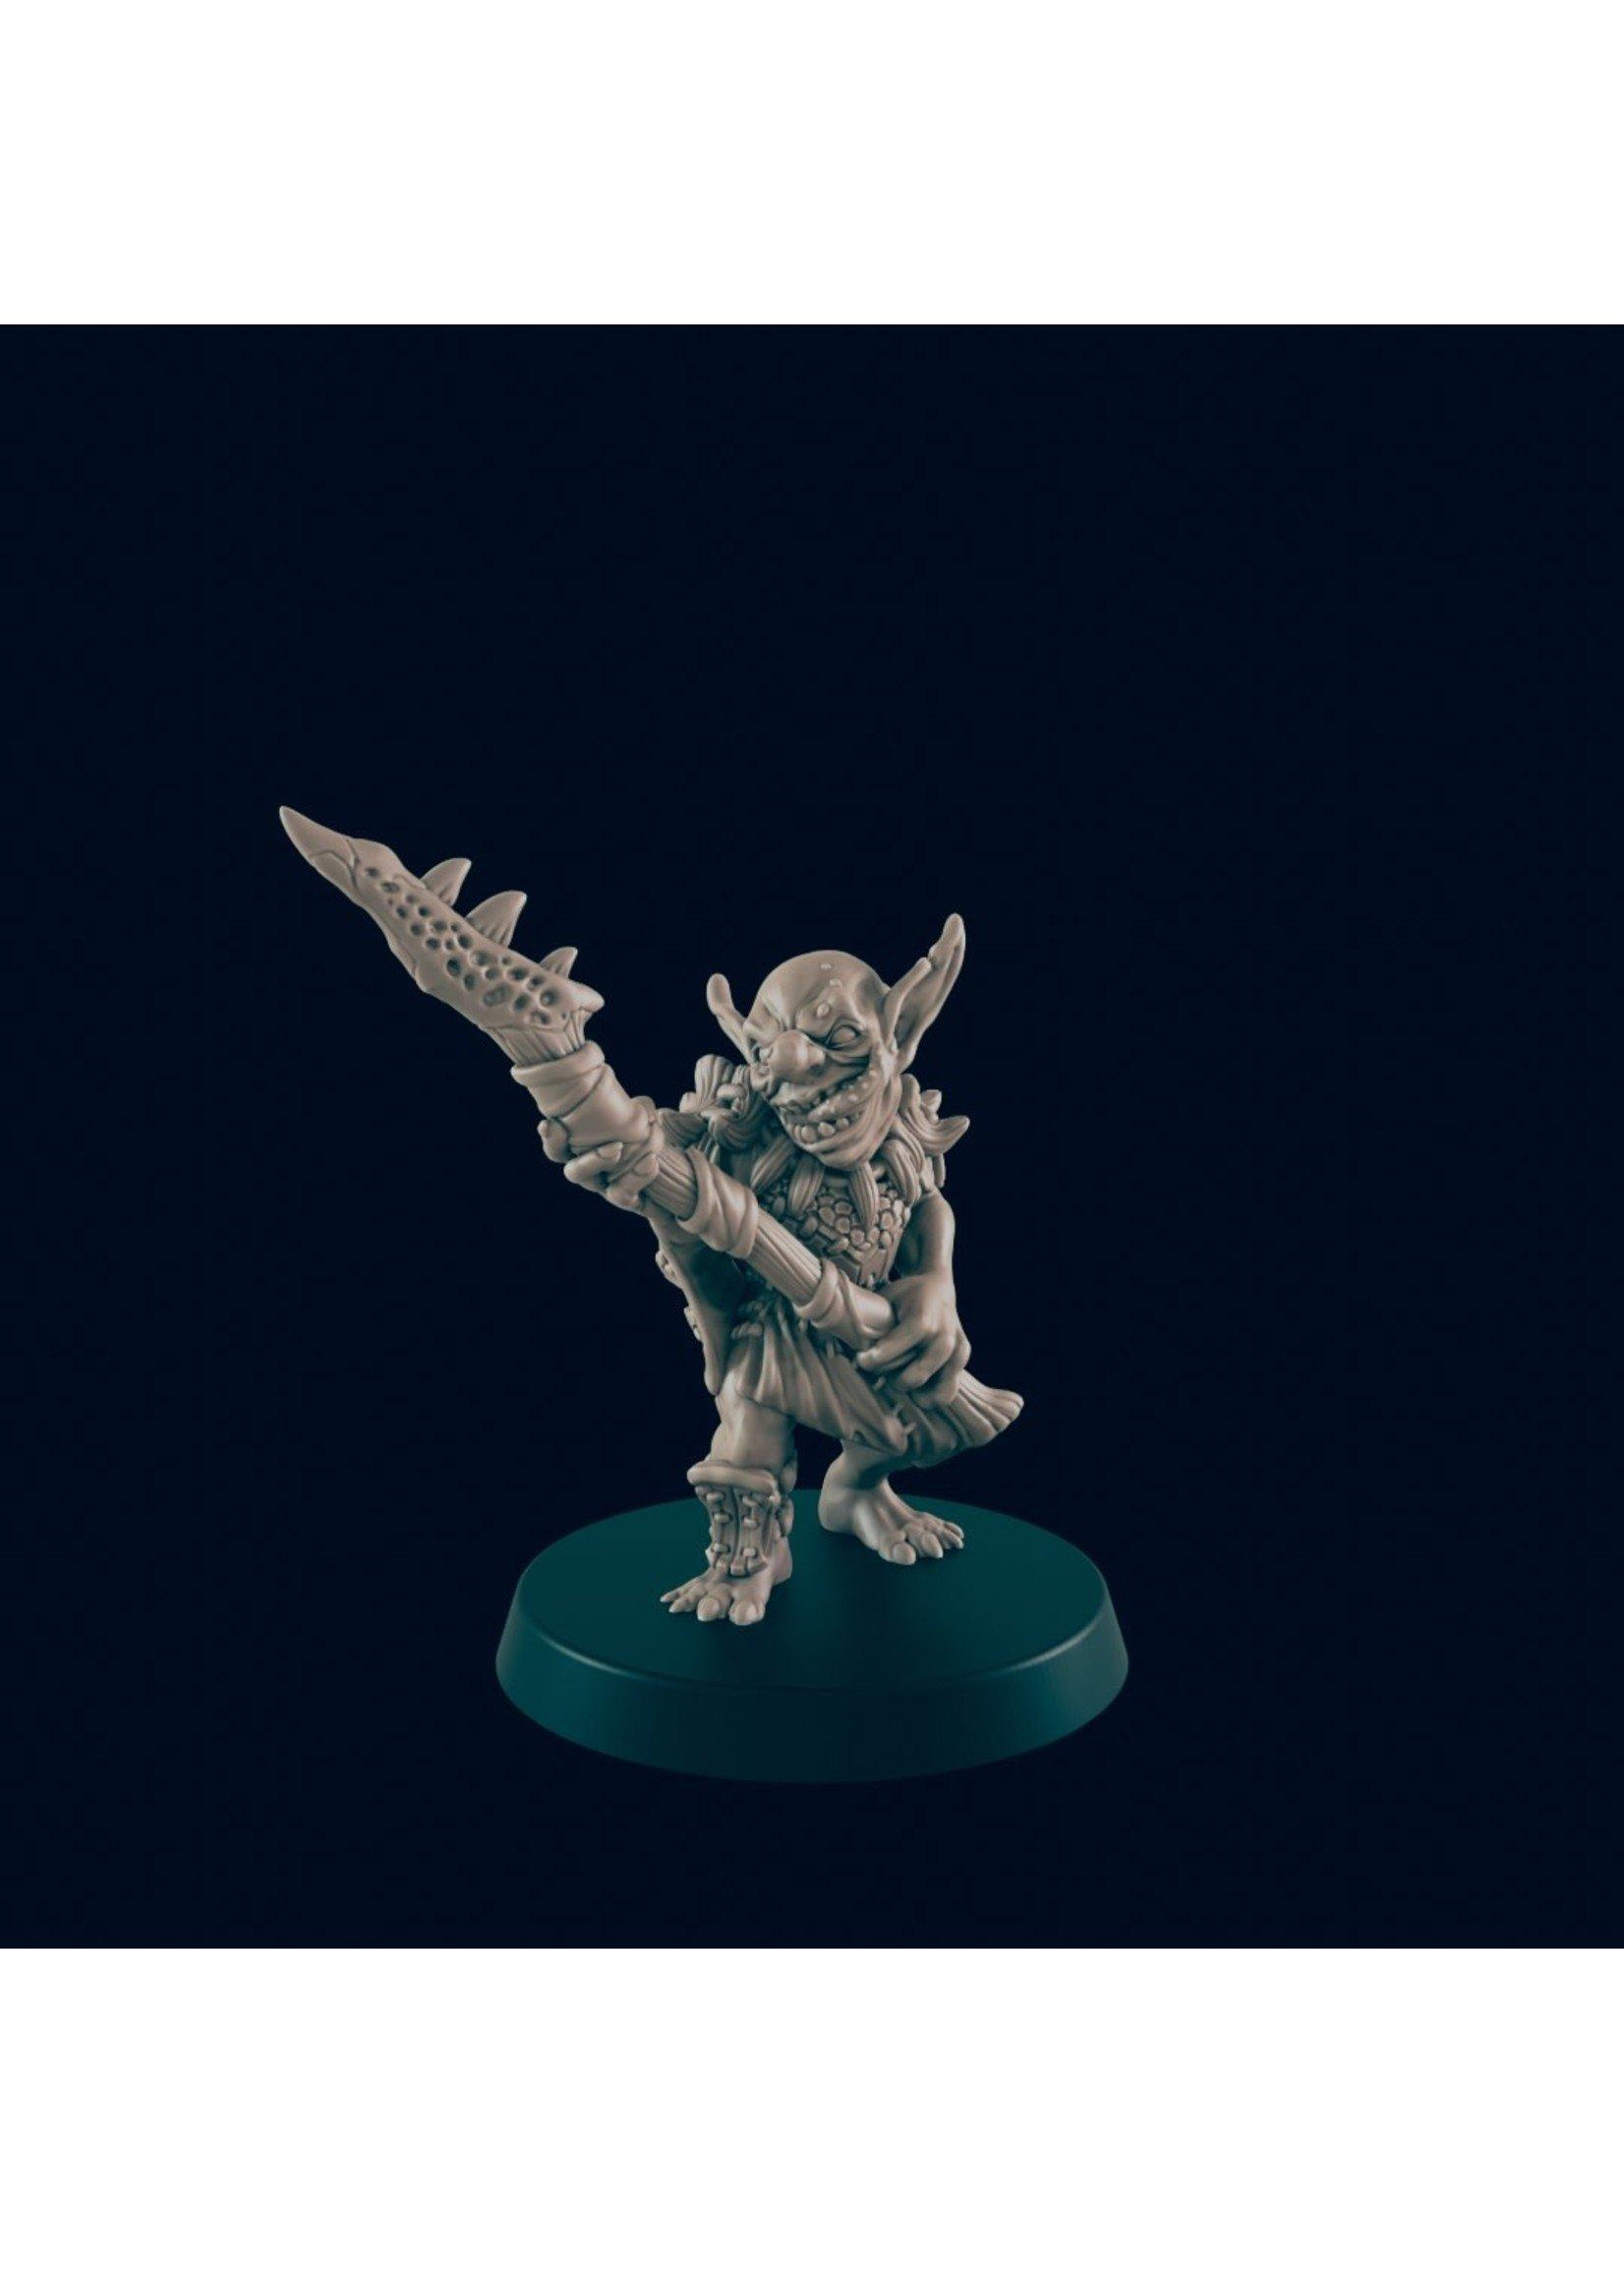 3D Printed Miniature - Goblin Spearman - Dungeons & Dragons - Beasts and Baddies KS